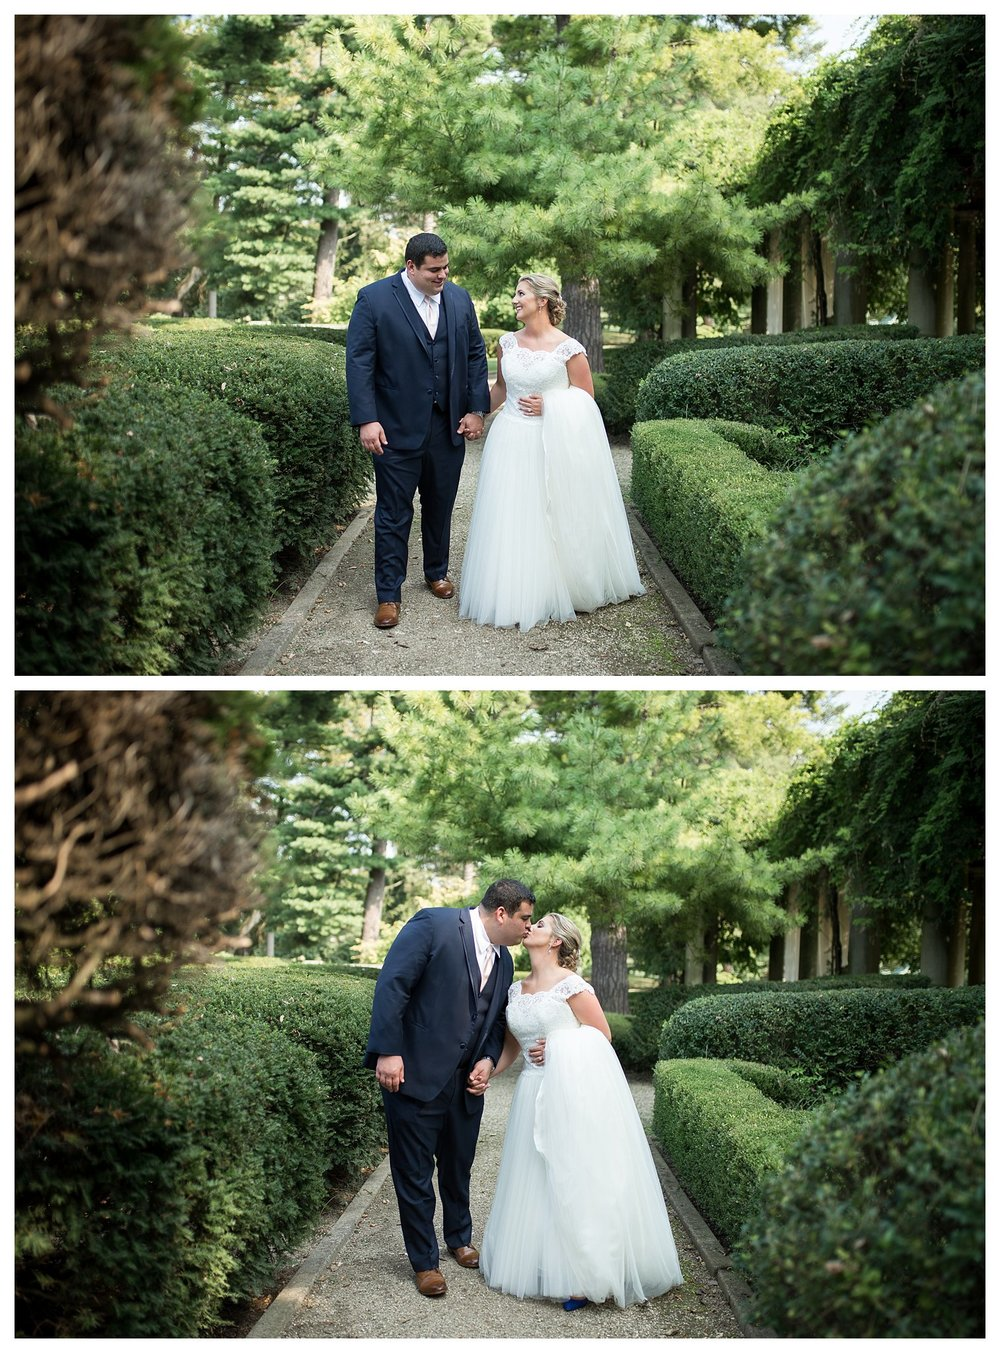 laurel-court-wedding-everleigh-photography-cincinnati-wedding-photographer-northern-ky-wedding-photographer-29